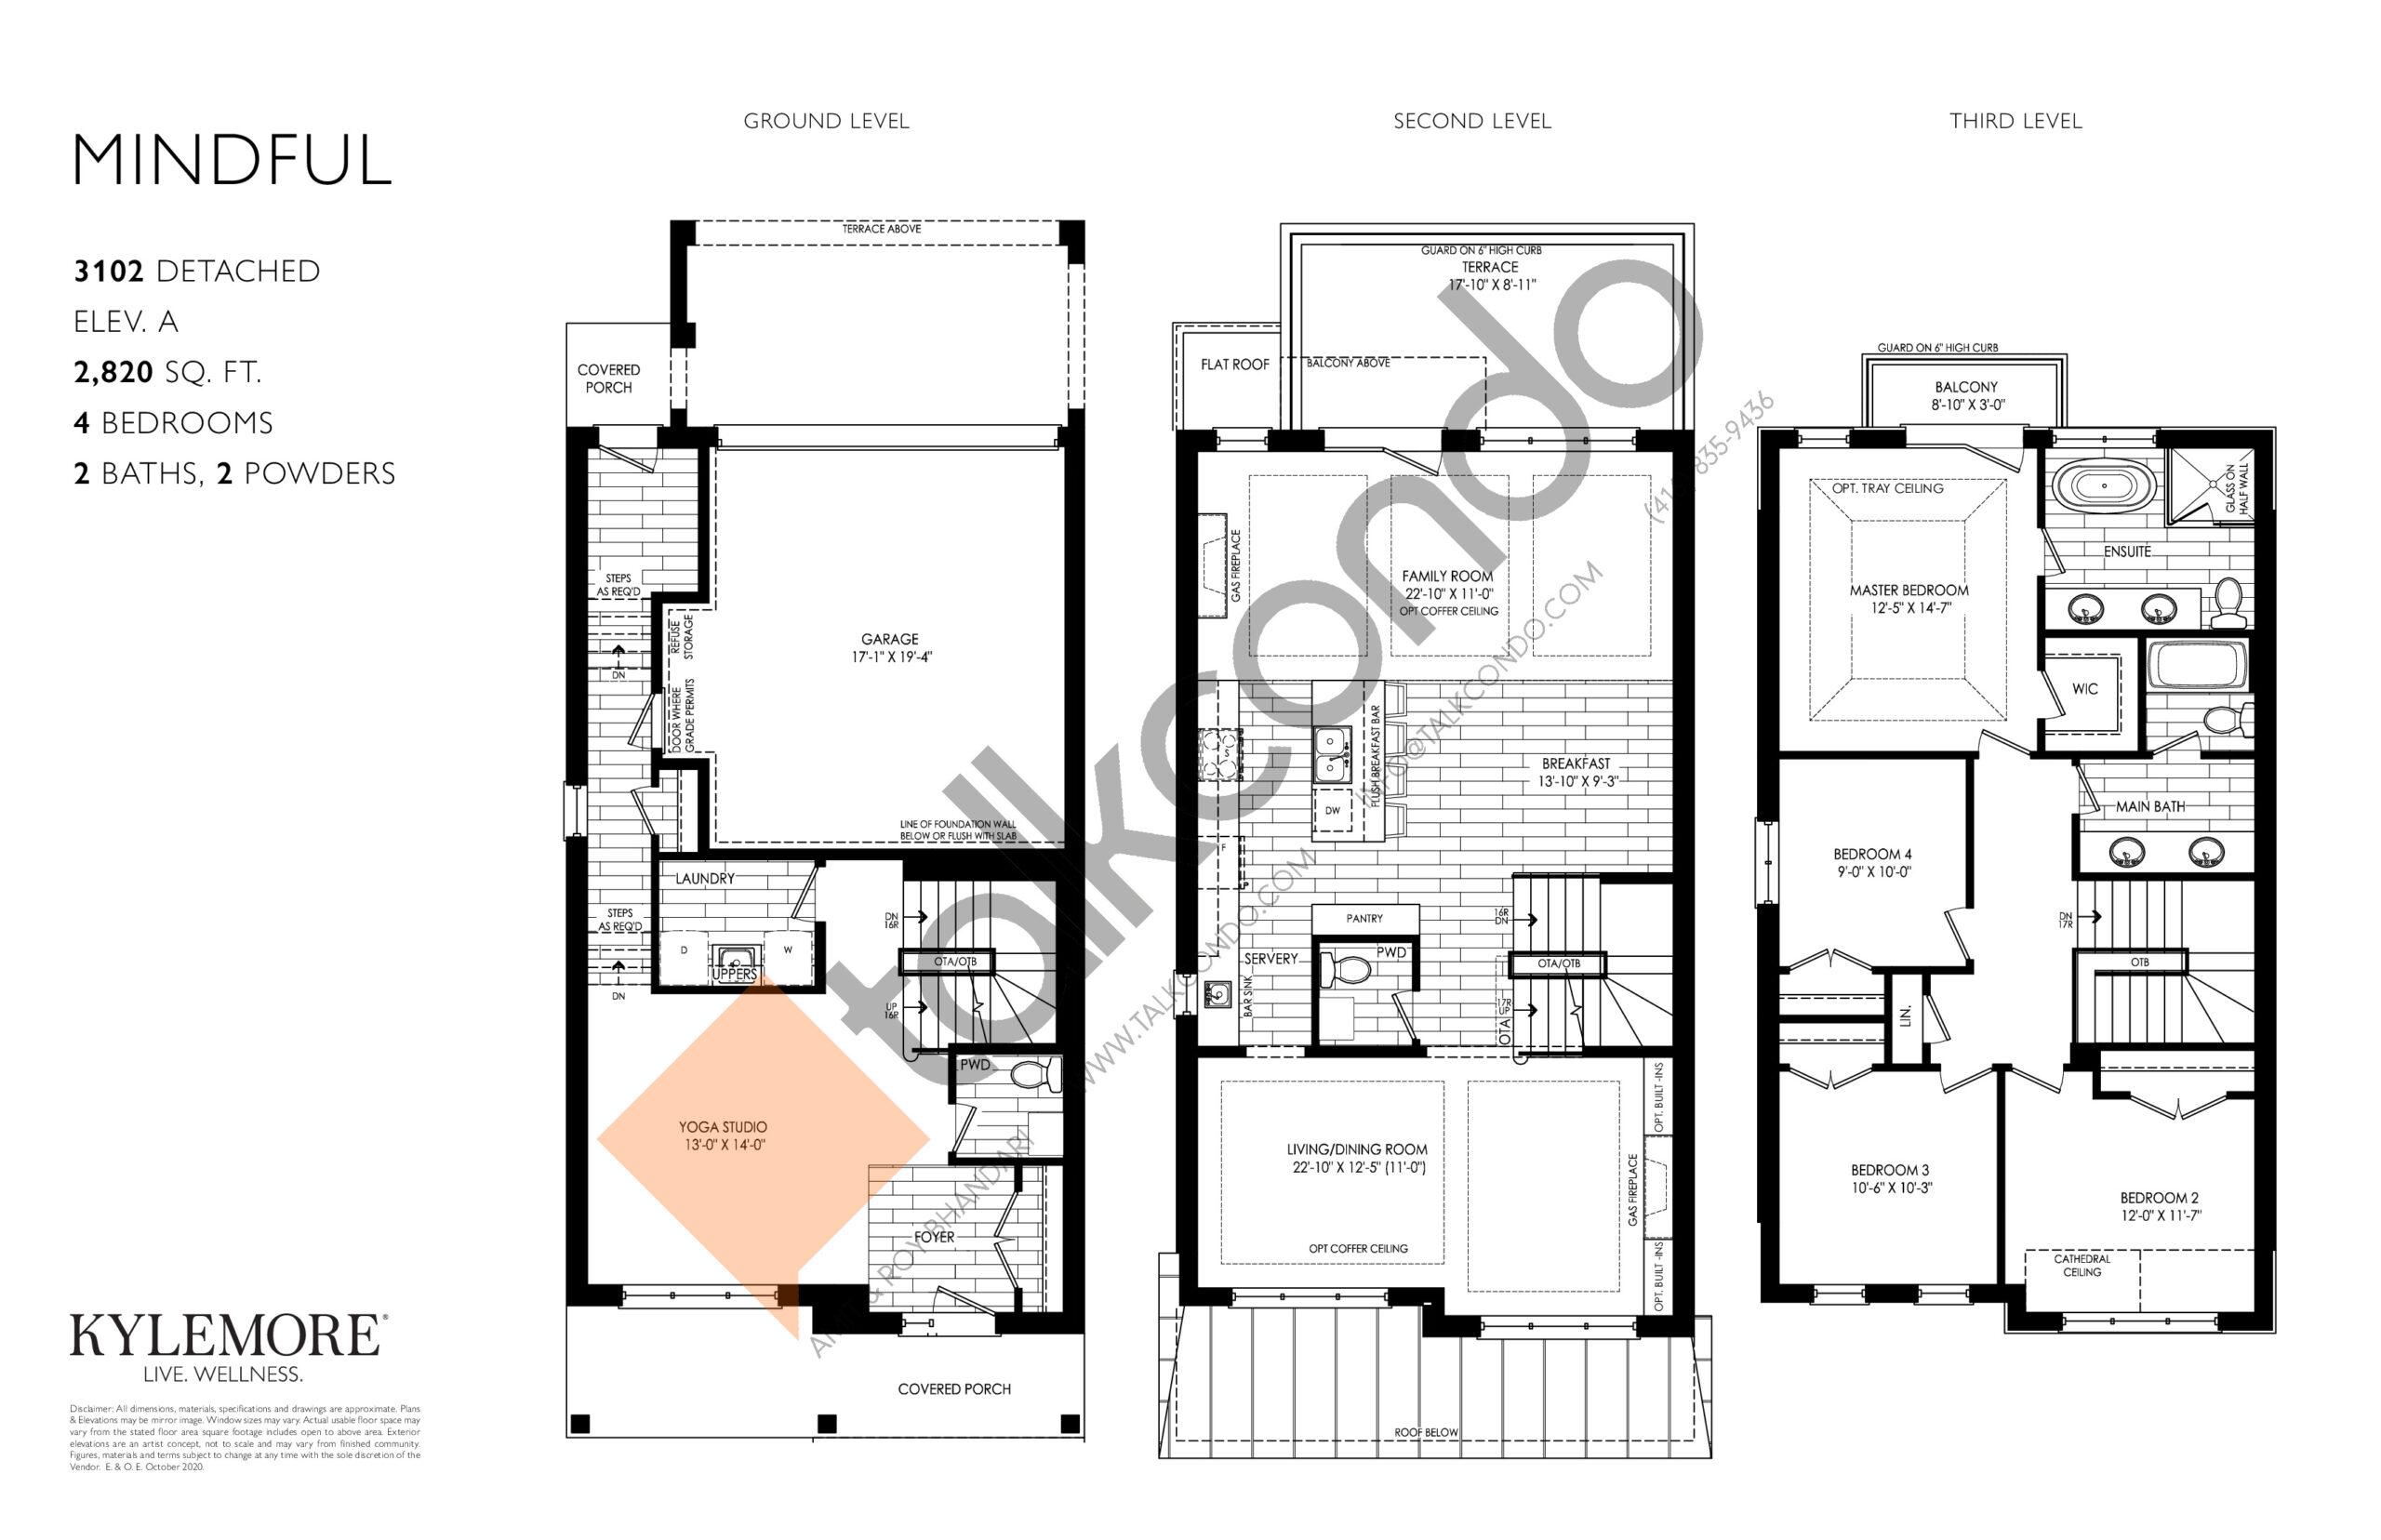 Mindful Floor Plan at Angus Glen South Village - 2820 sq.ft